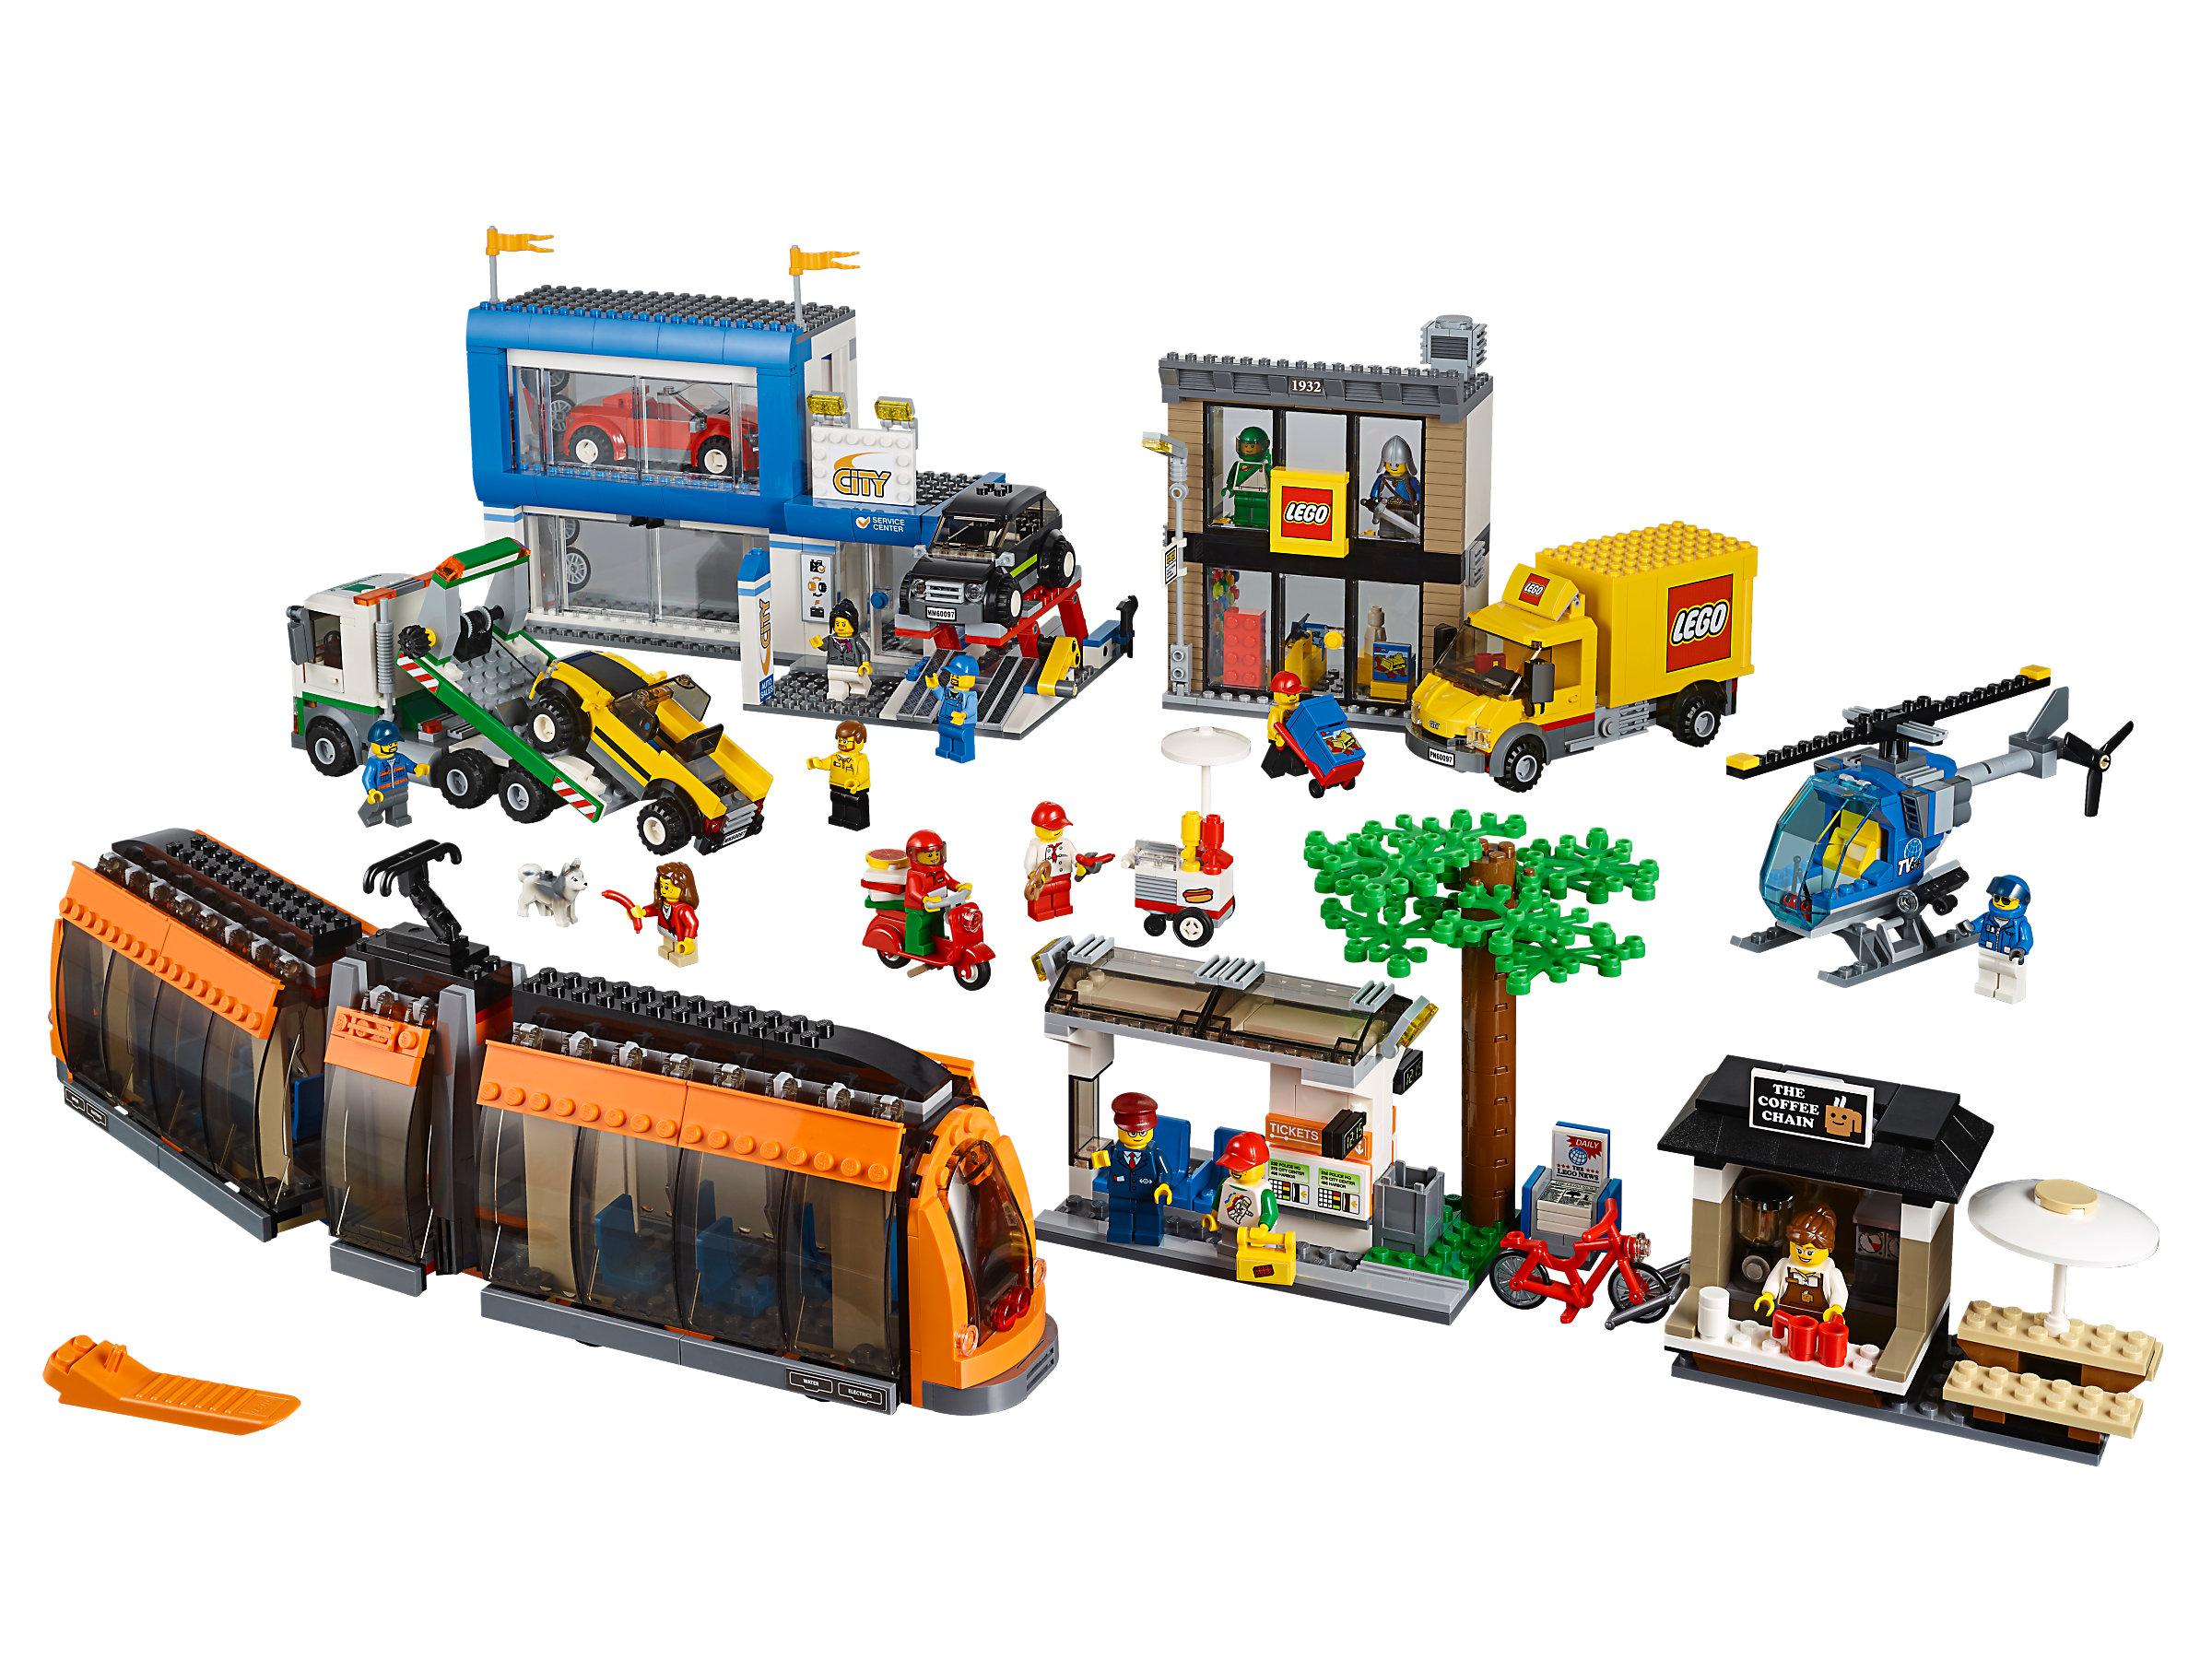 Lego Lego Store w Mini-Figures City Square Train 60097 B5 Book-5 *New Sealed*